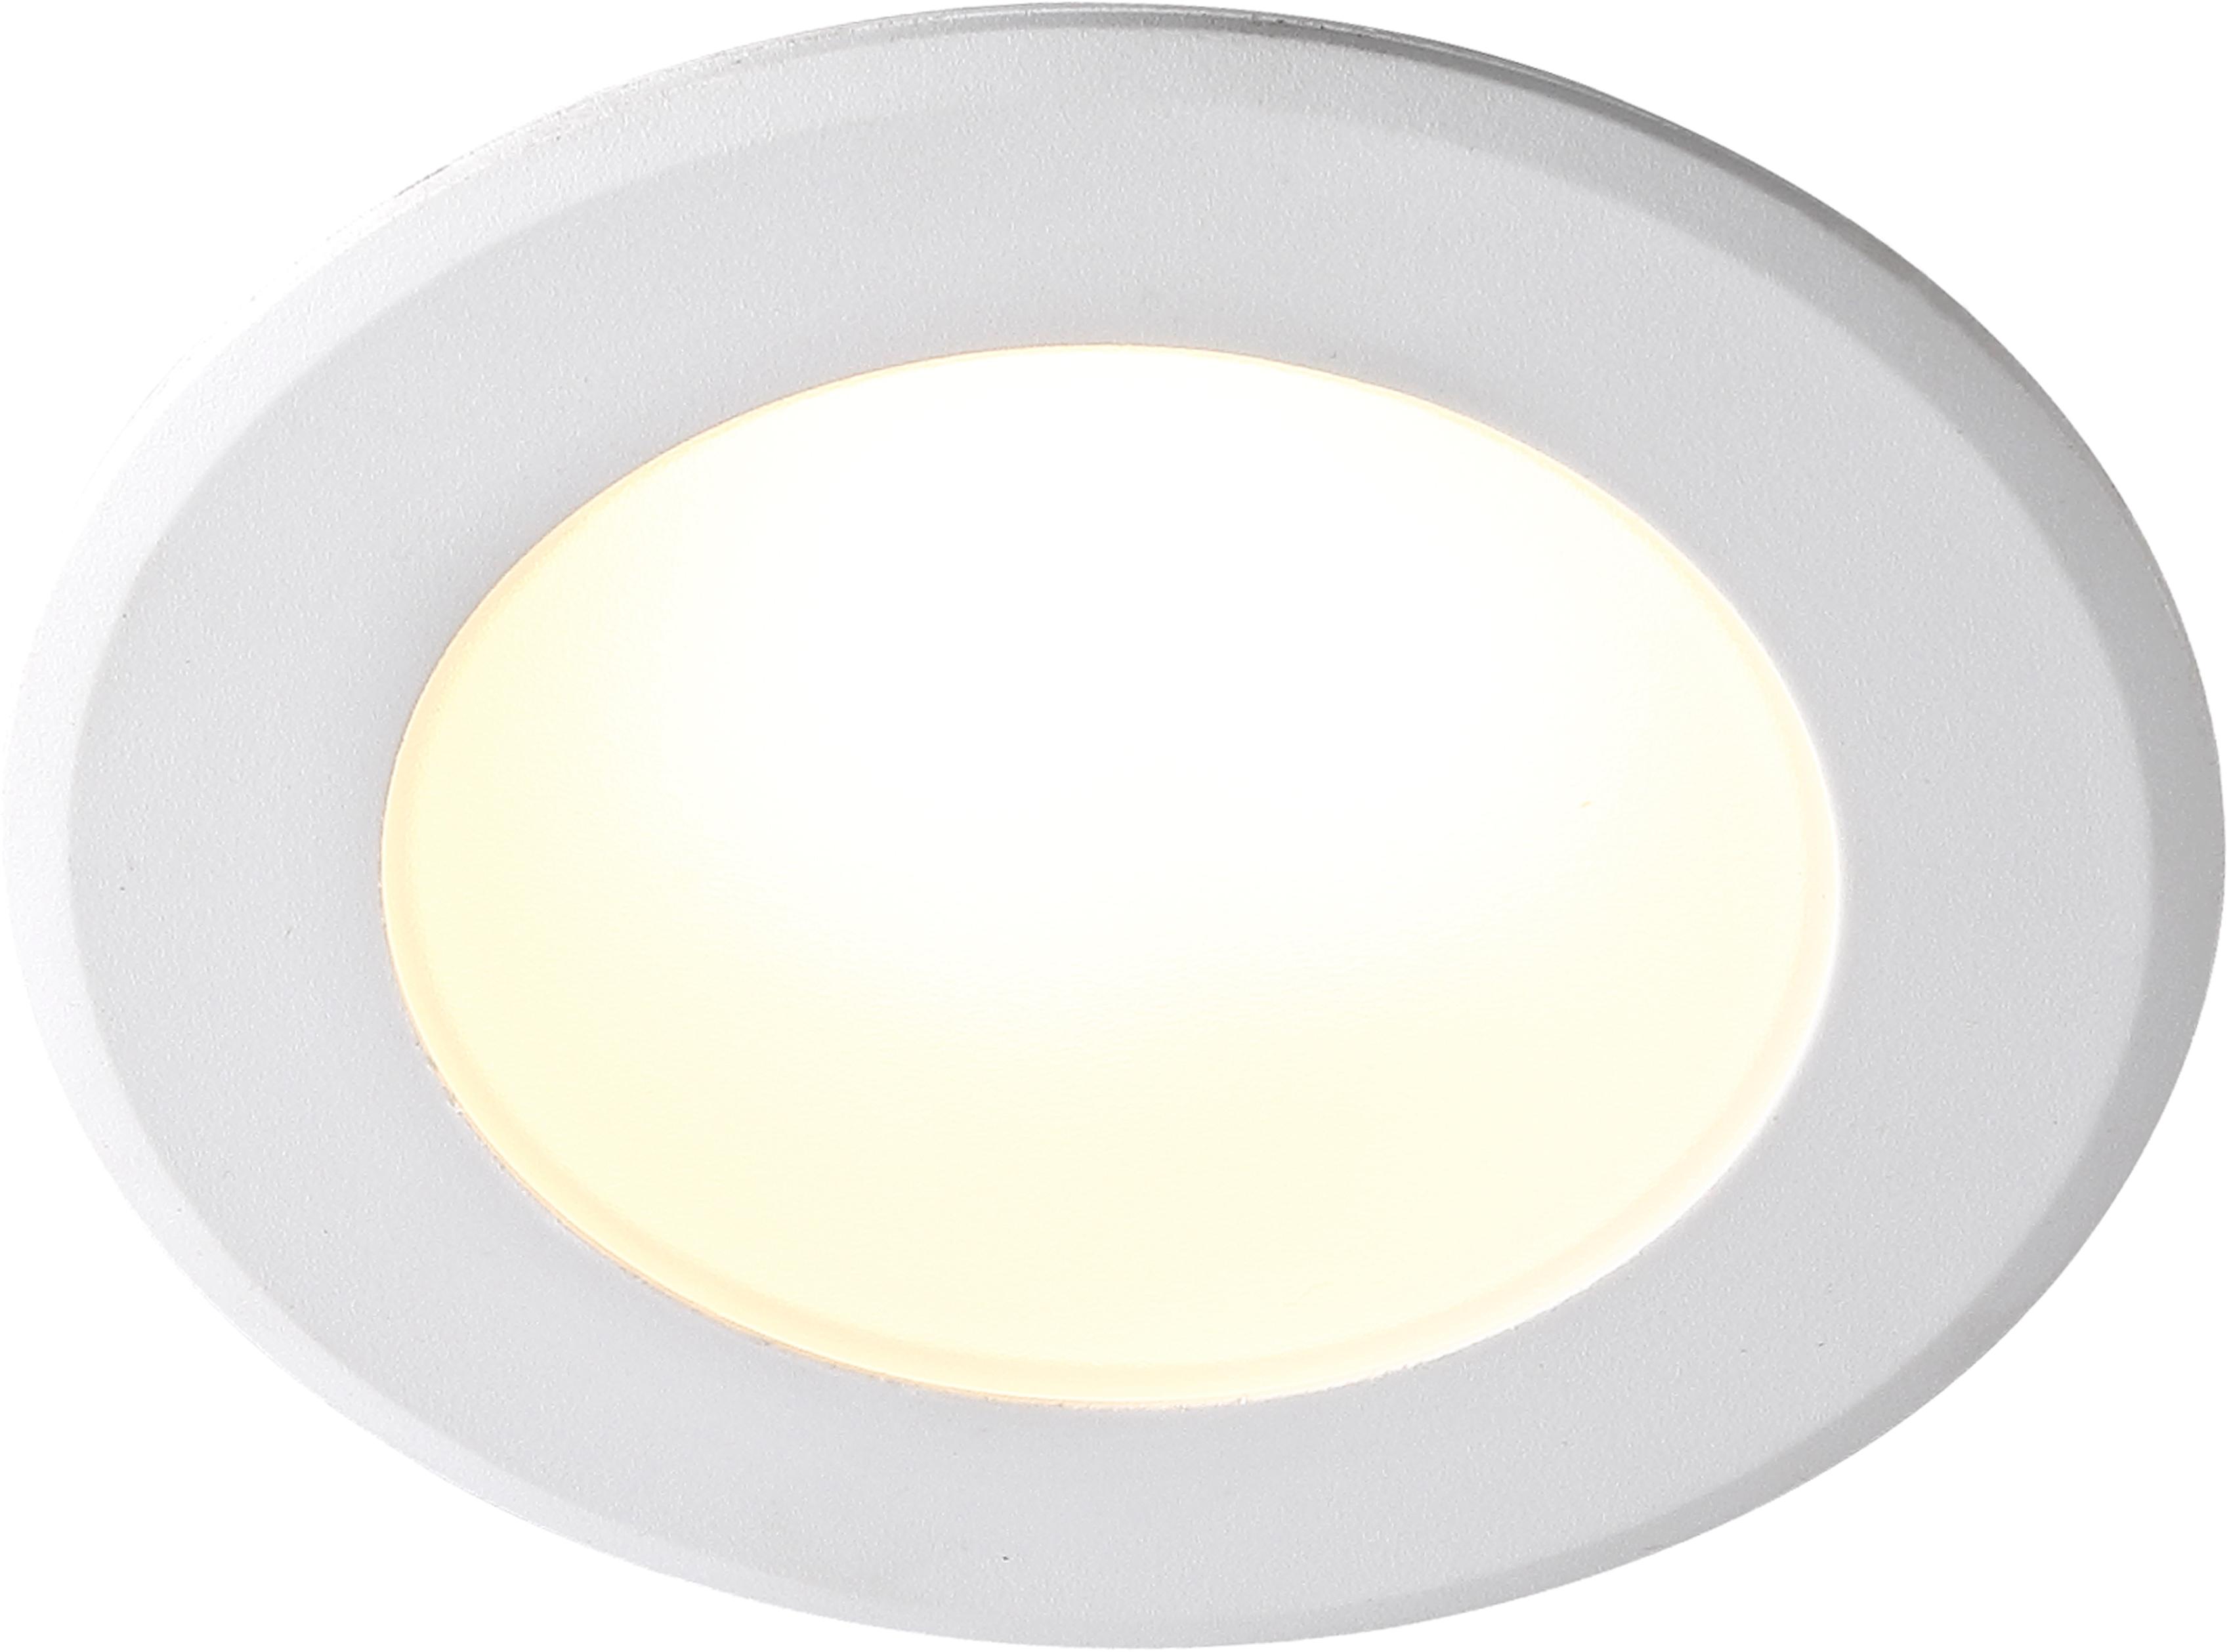 Nordlux,LED Einbaustrahler 2er Set Birla